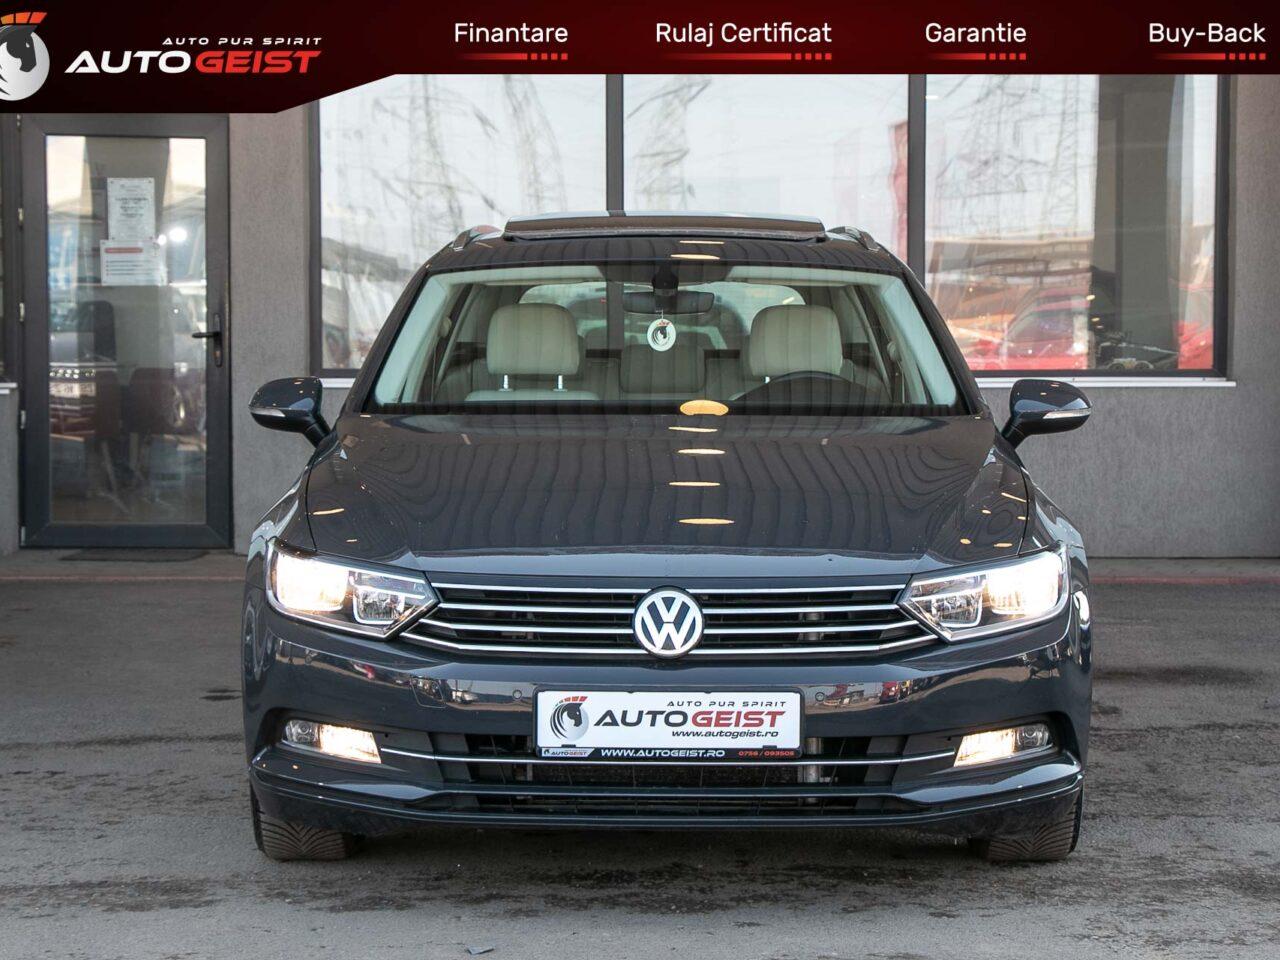 VW-PASSAT-break-panoramic-4500